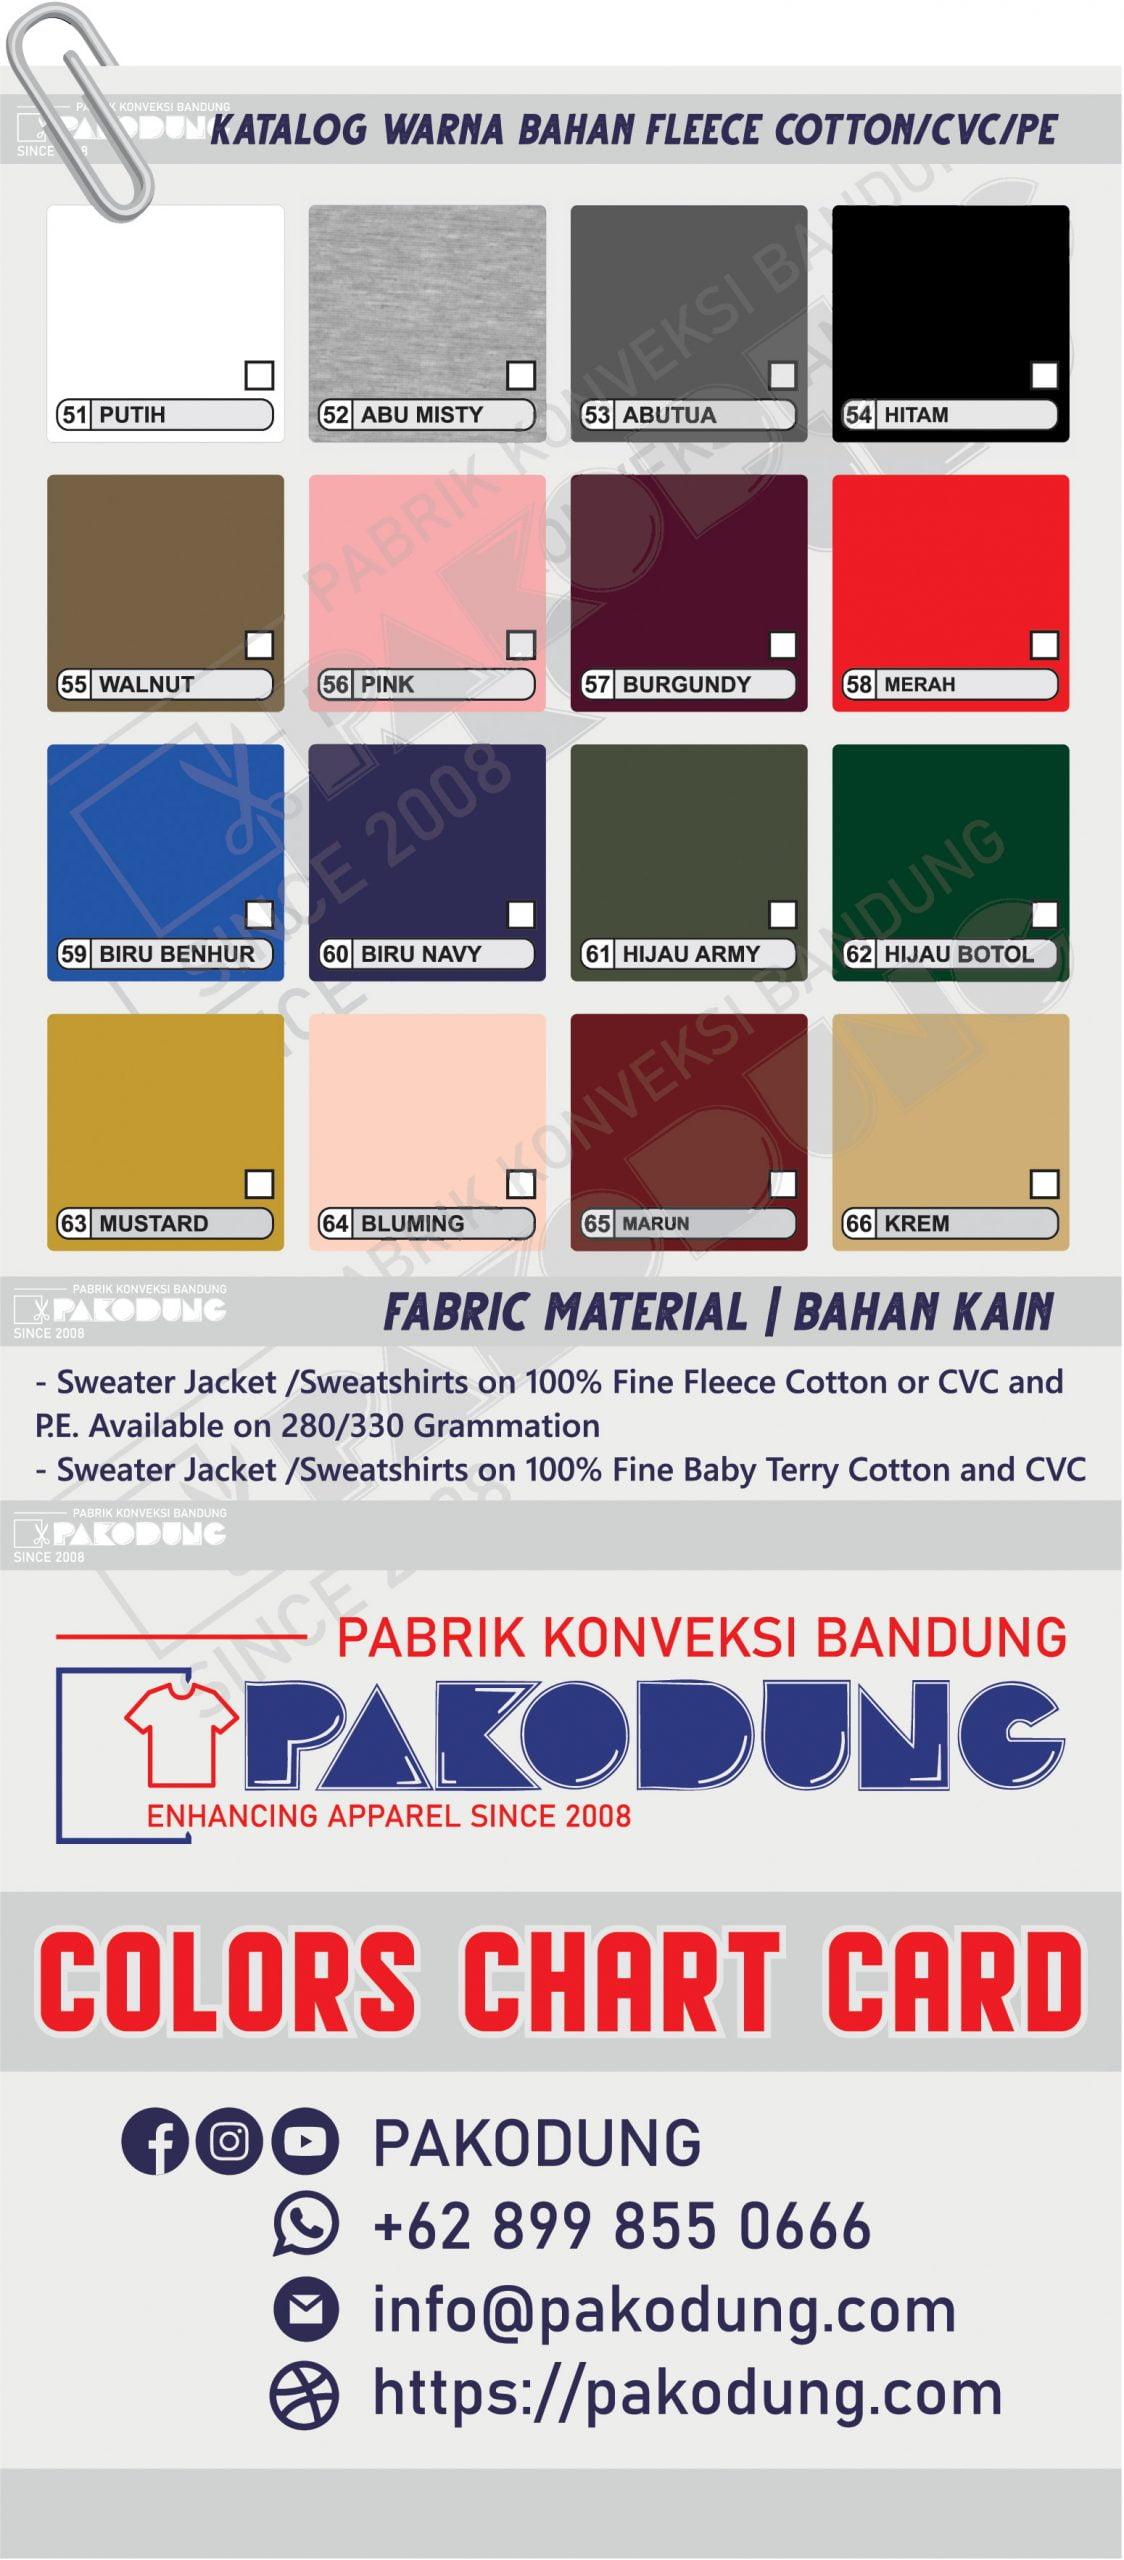 katalog warna bahan fleece katun